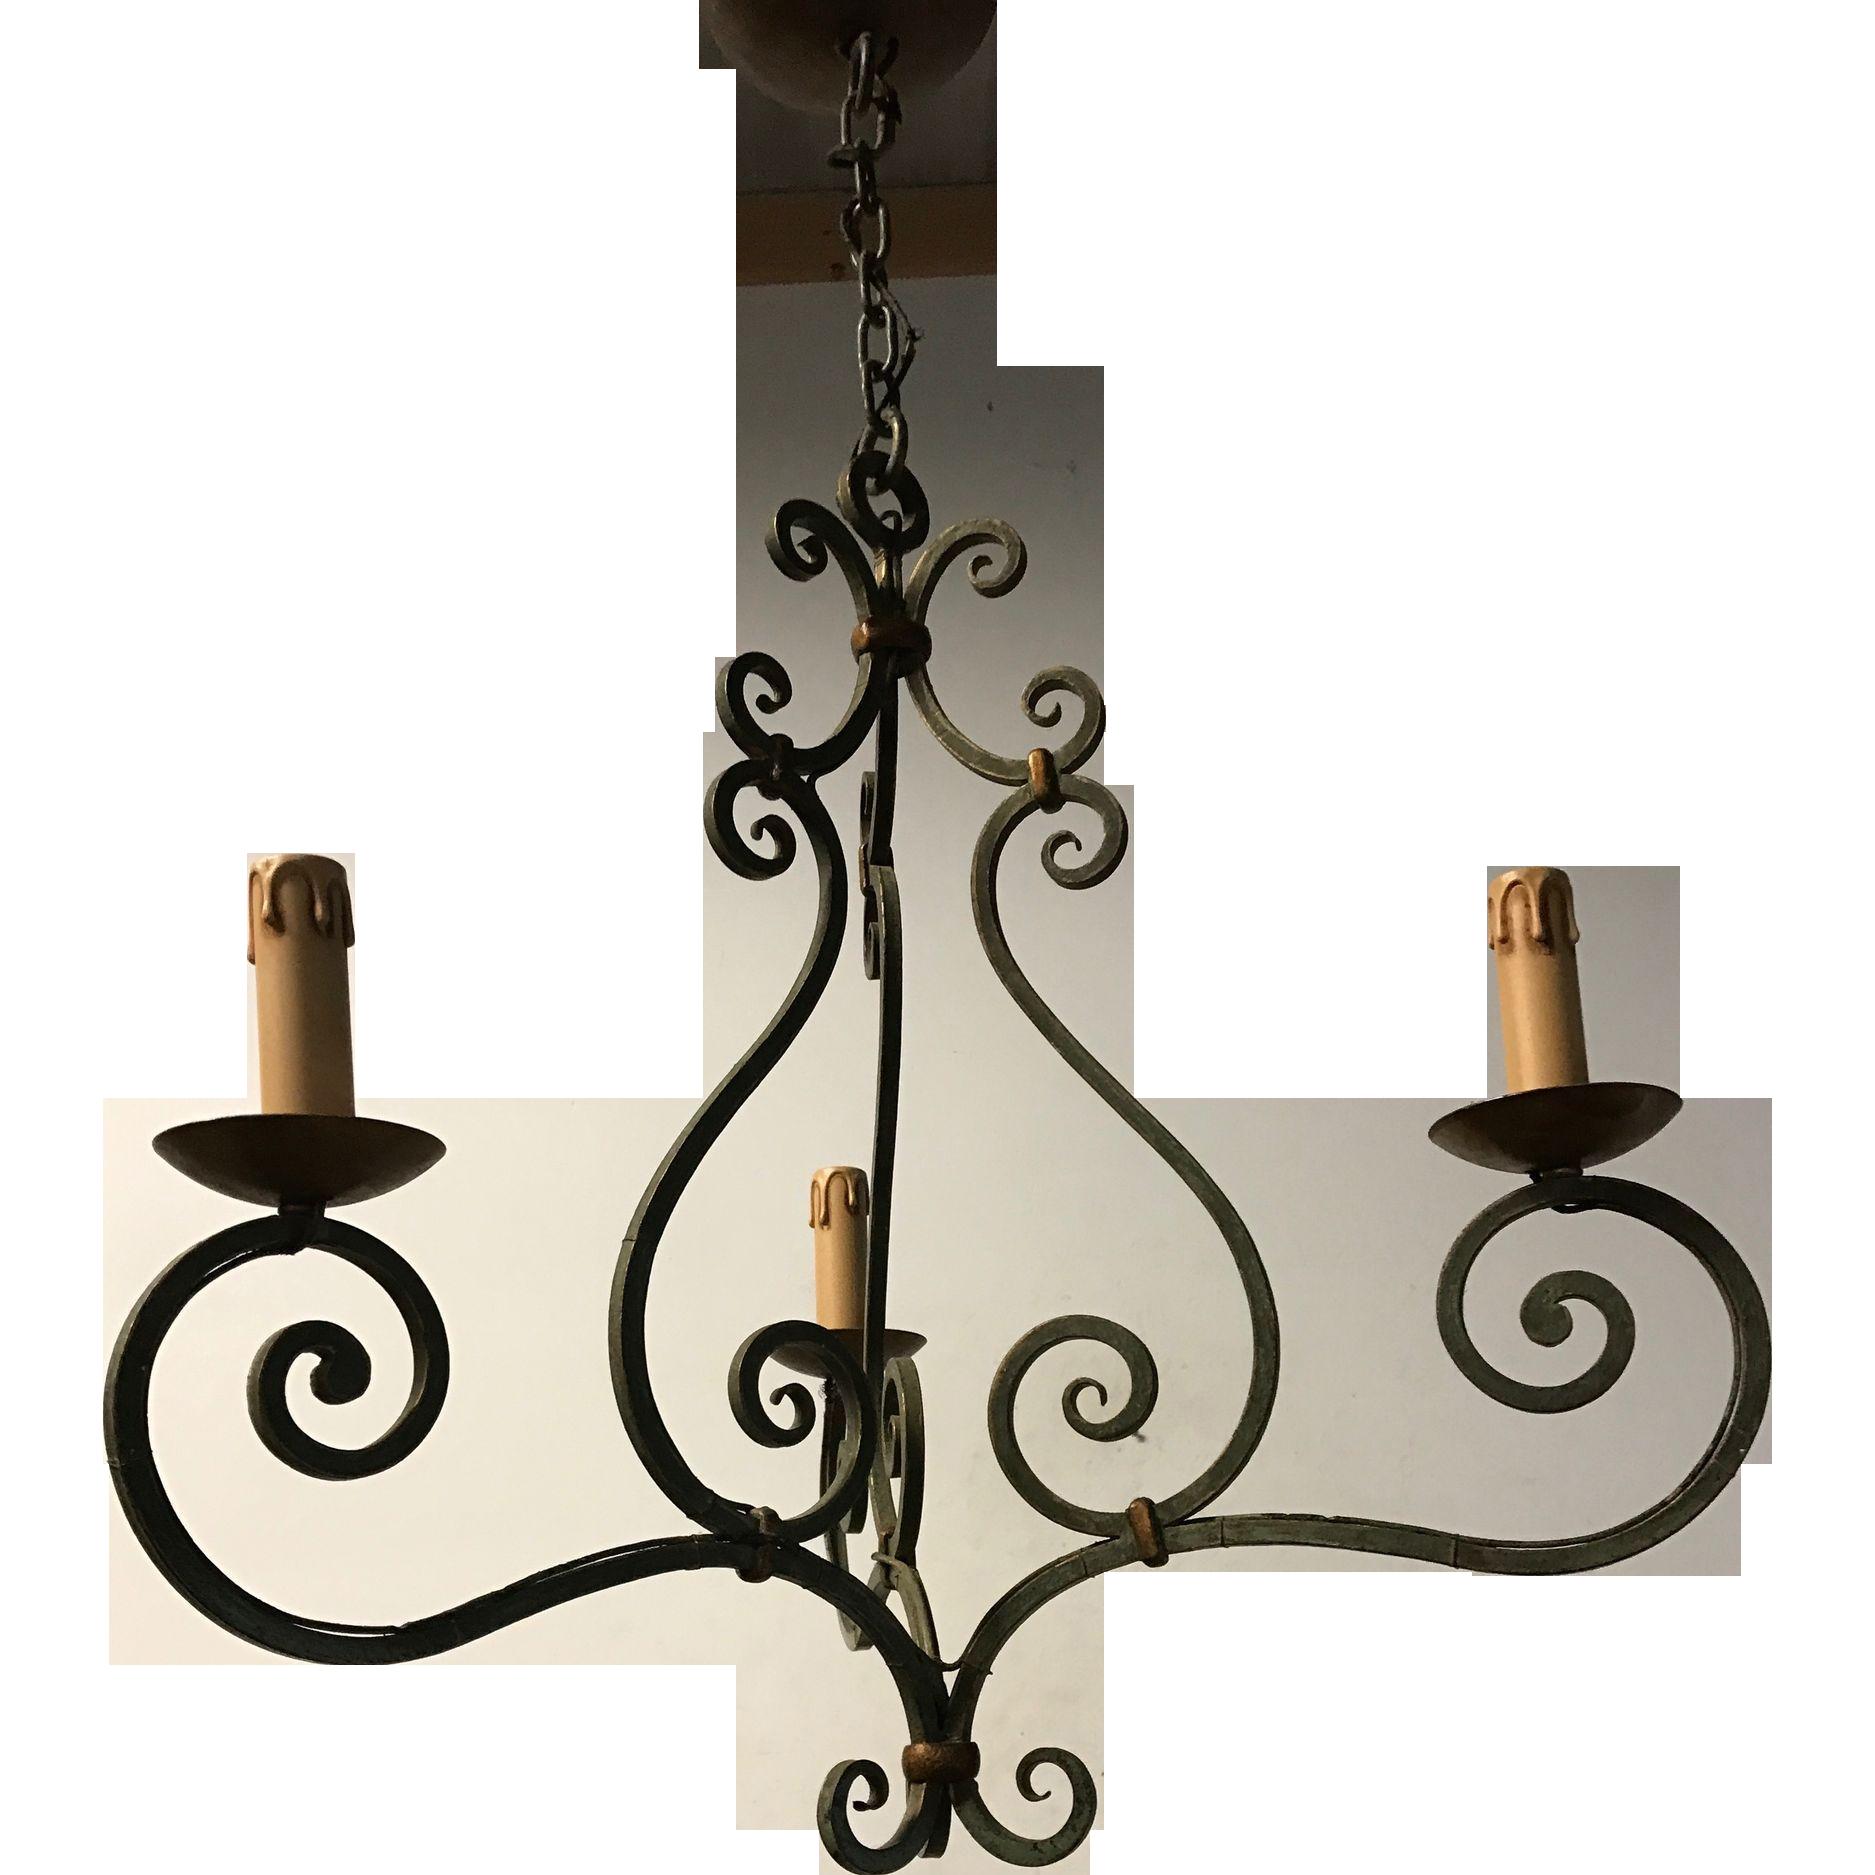 Wrought Iron 3-light Pendant Light Ceiling Fixture